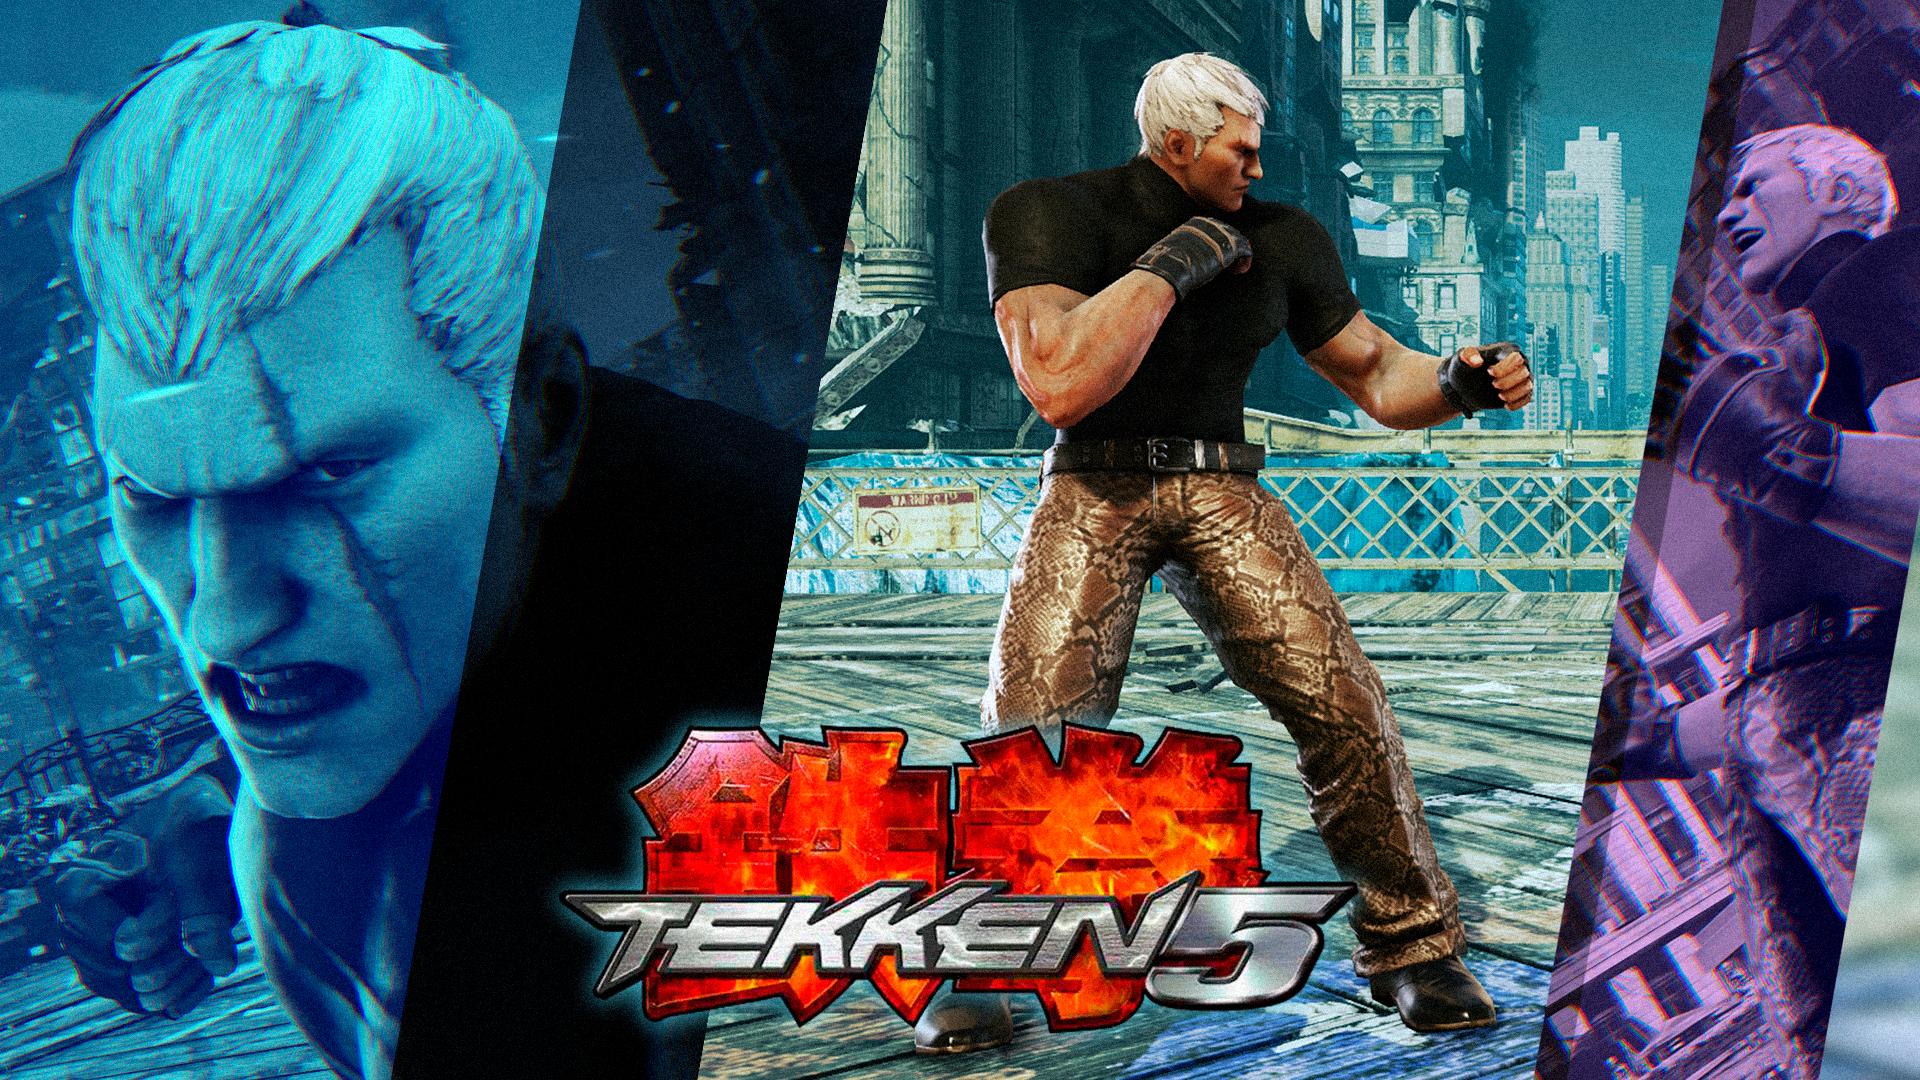 Tekken 5 Inspired Bryan Fury By Mattplara On Deviantart